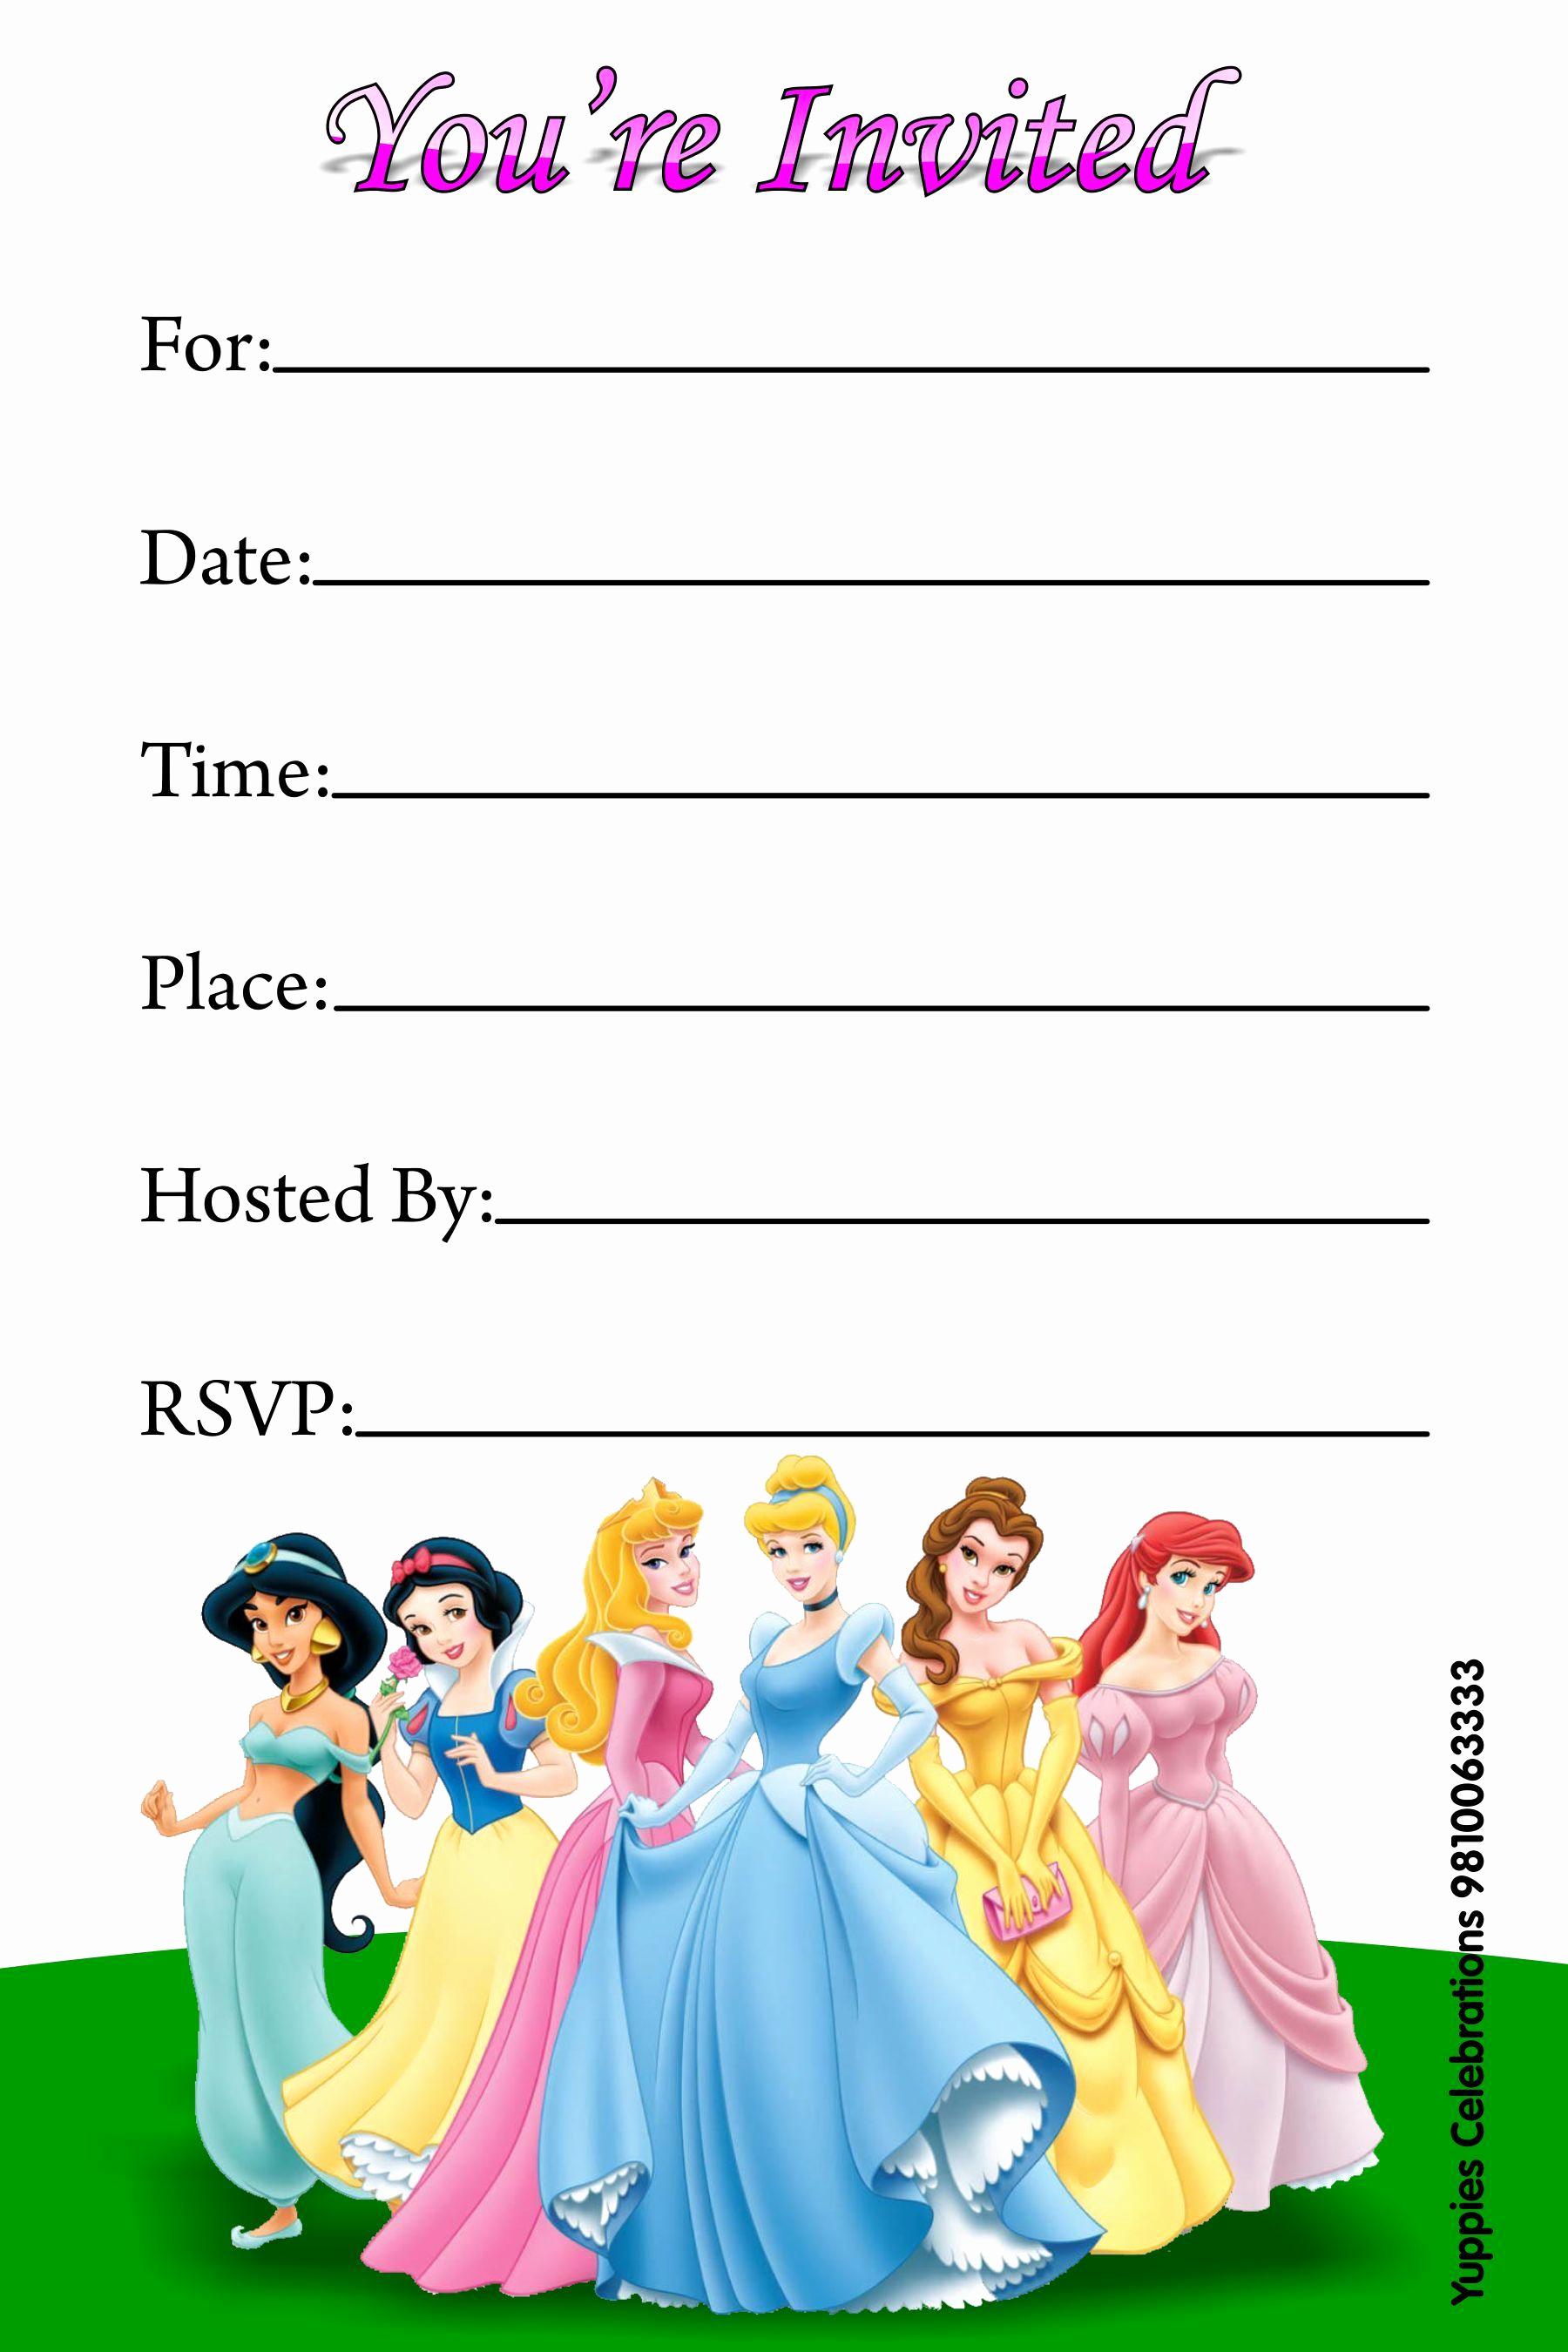 Disney Princess Invitation Templates Free Unique Disney Princess Invitations